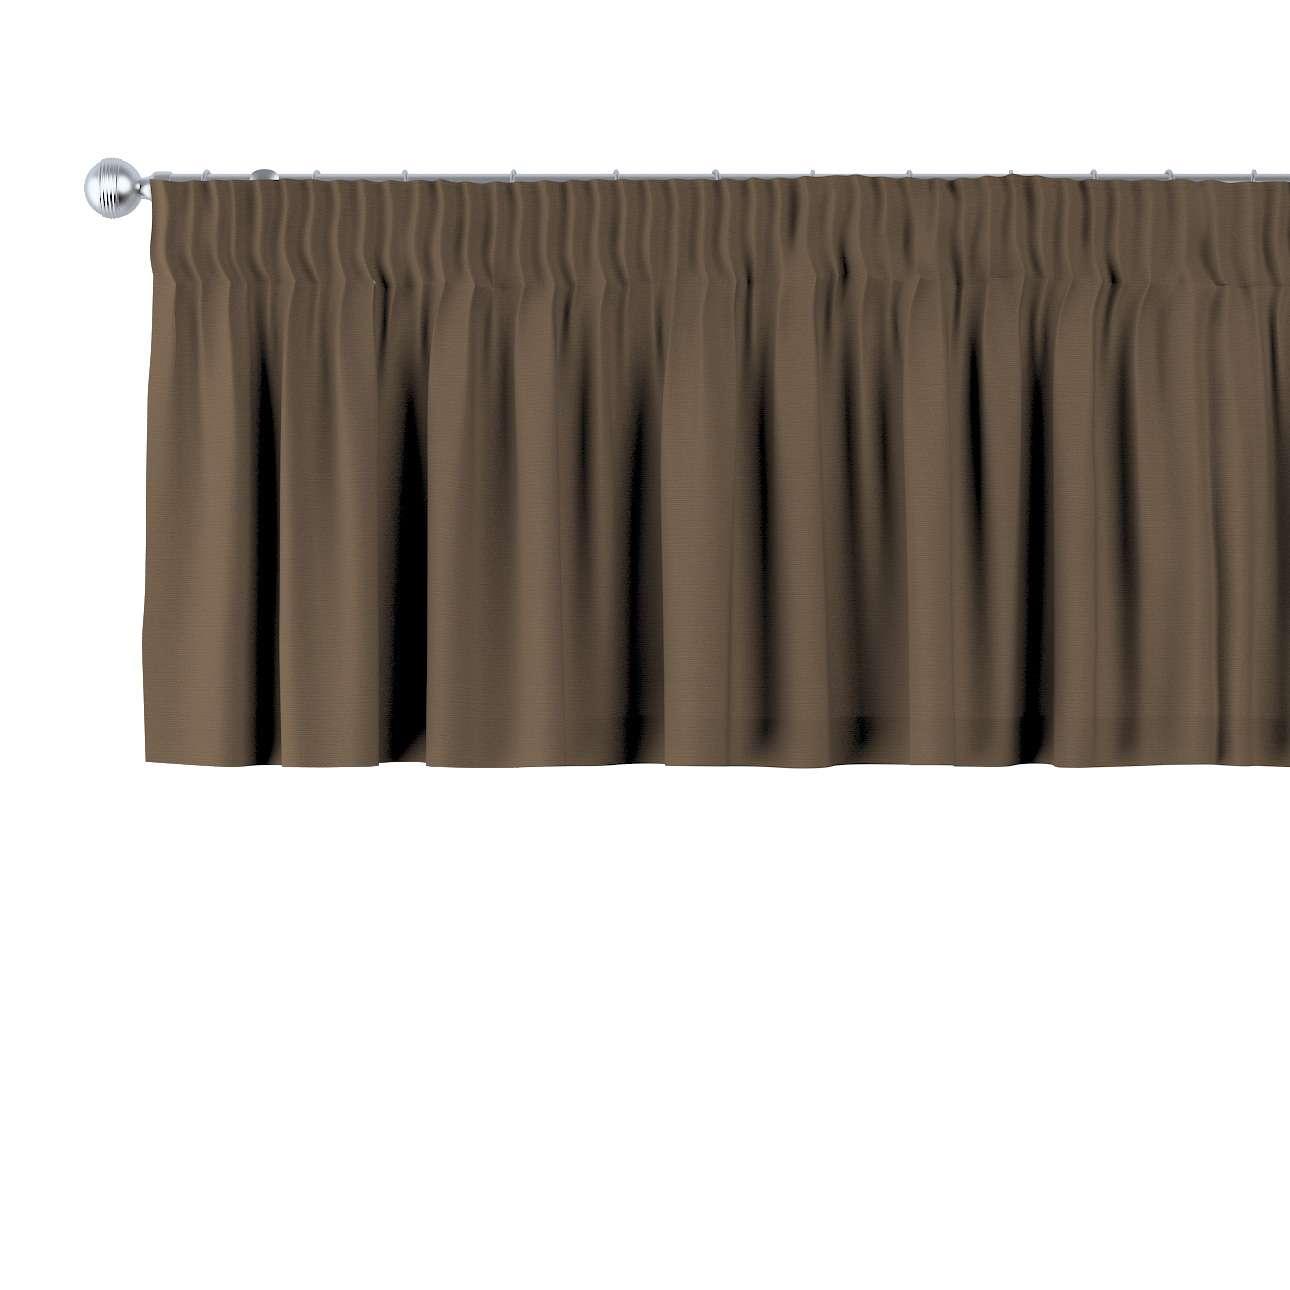 Kurzgardine mit Kräuselband 130 x 40 cm von der Kollektion Cotton Panama, Stoff: 702-02